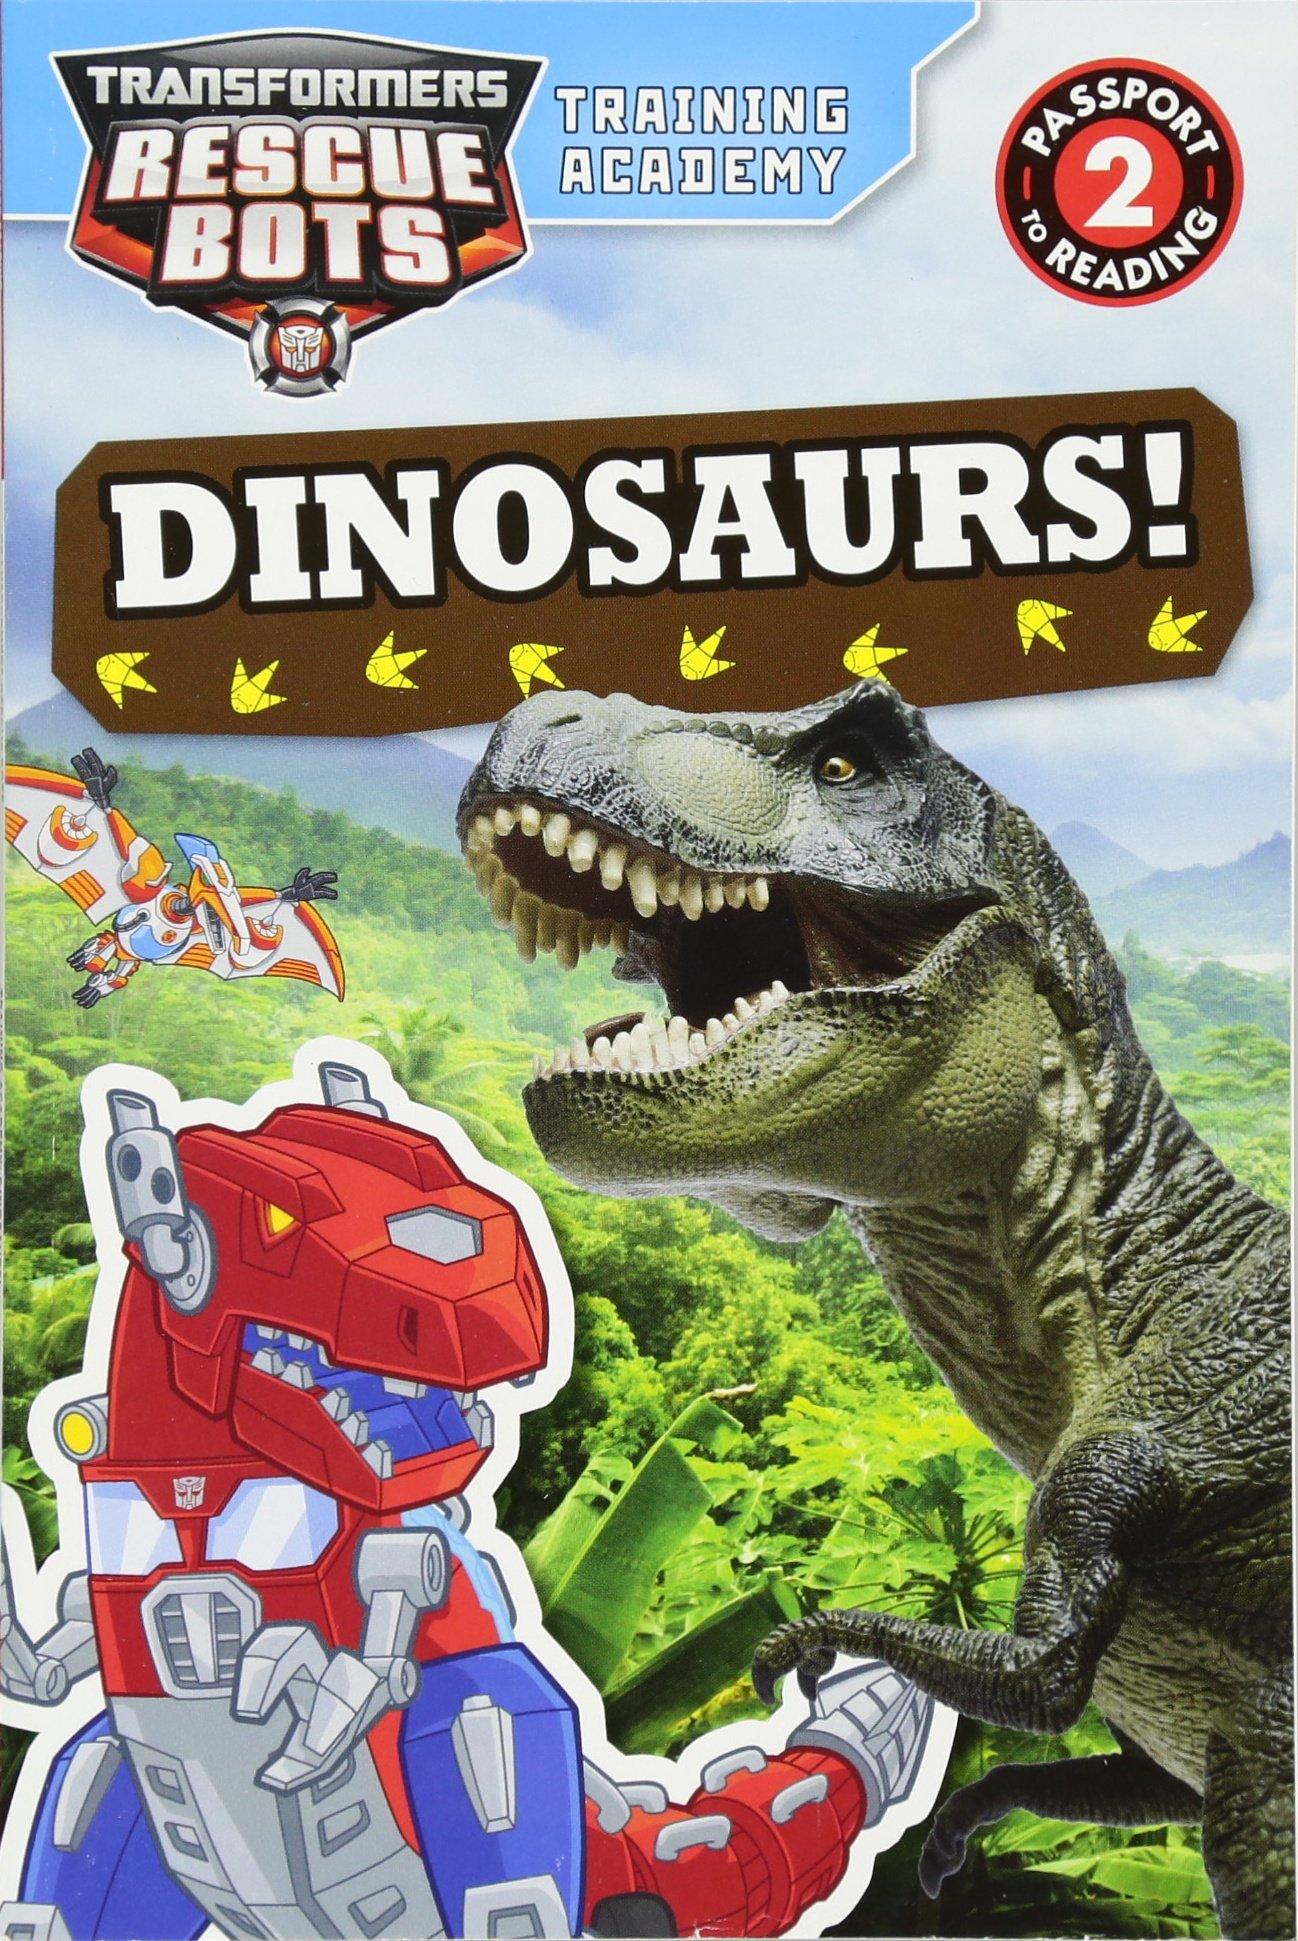 Transformers Rescue Bots Training Dinosaurs